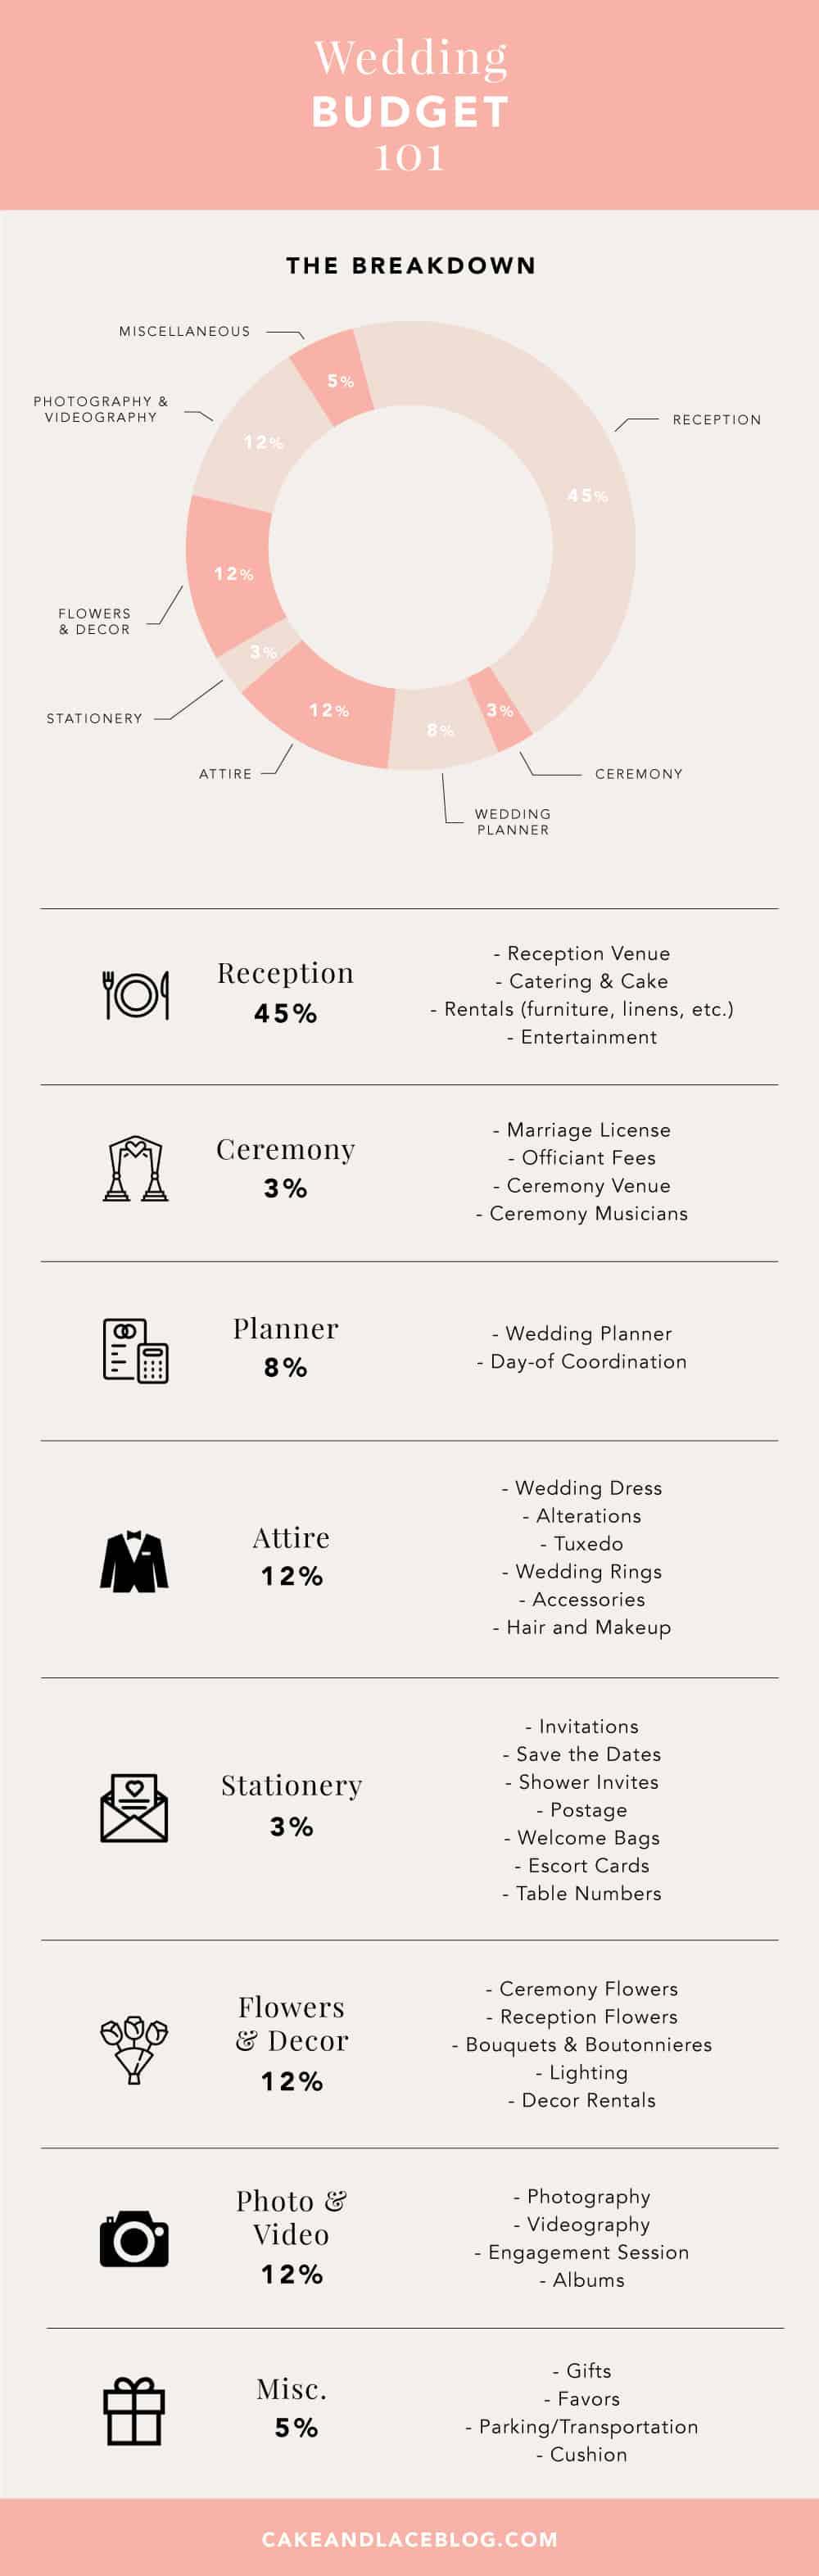 Wedding budget 101 cake lace wedding blog wedding budget breakdown junglespirit Images